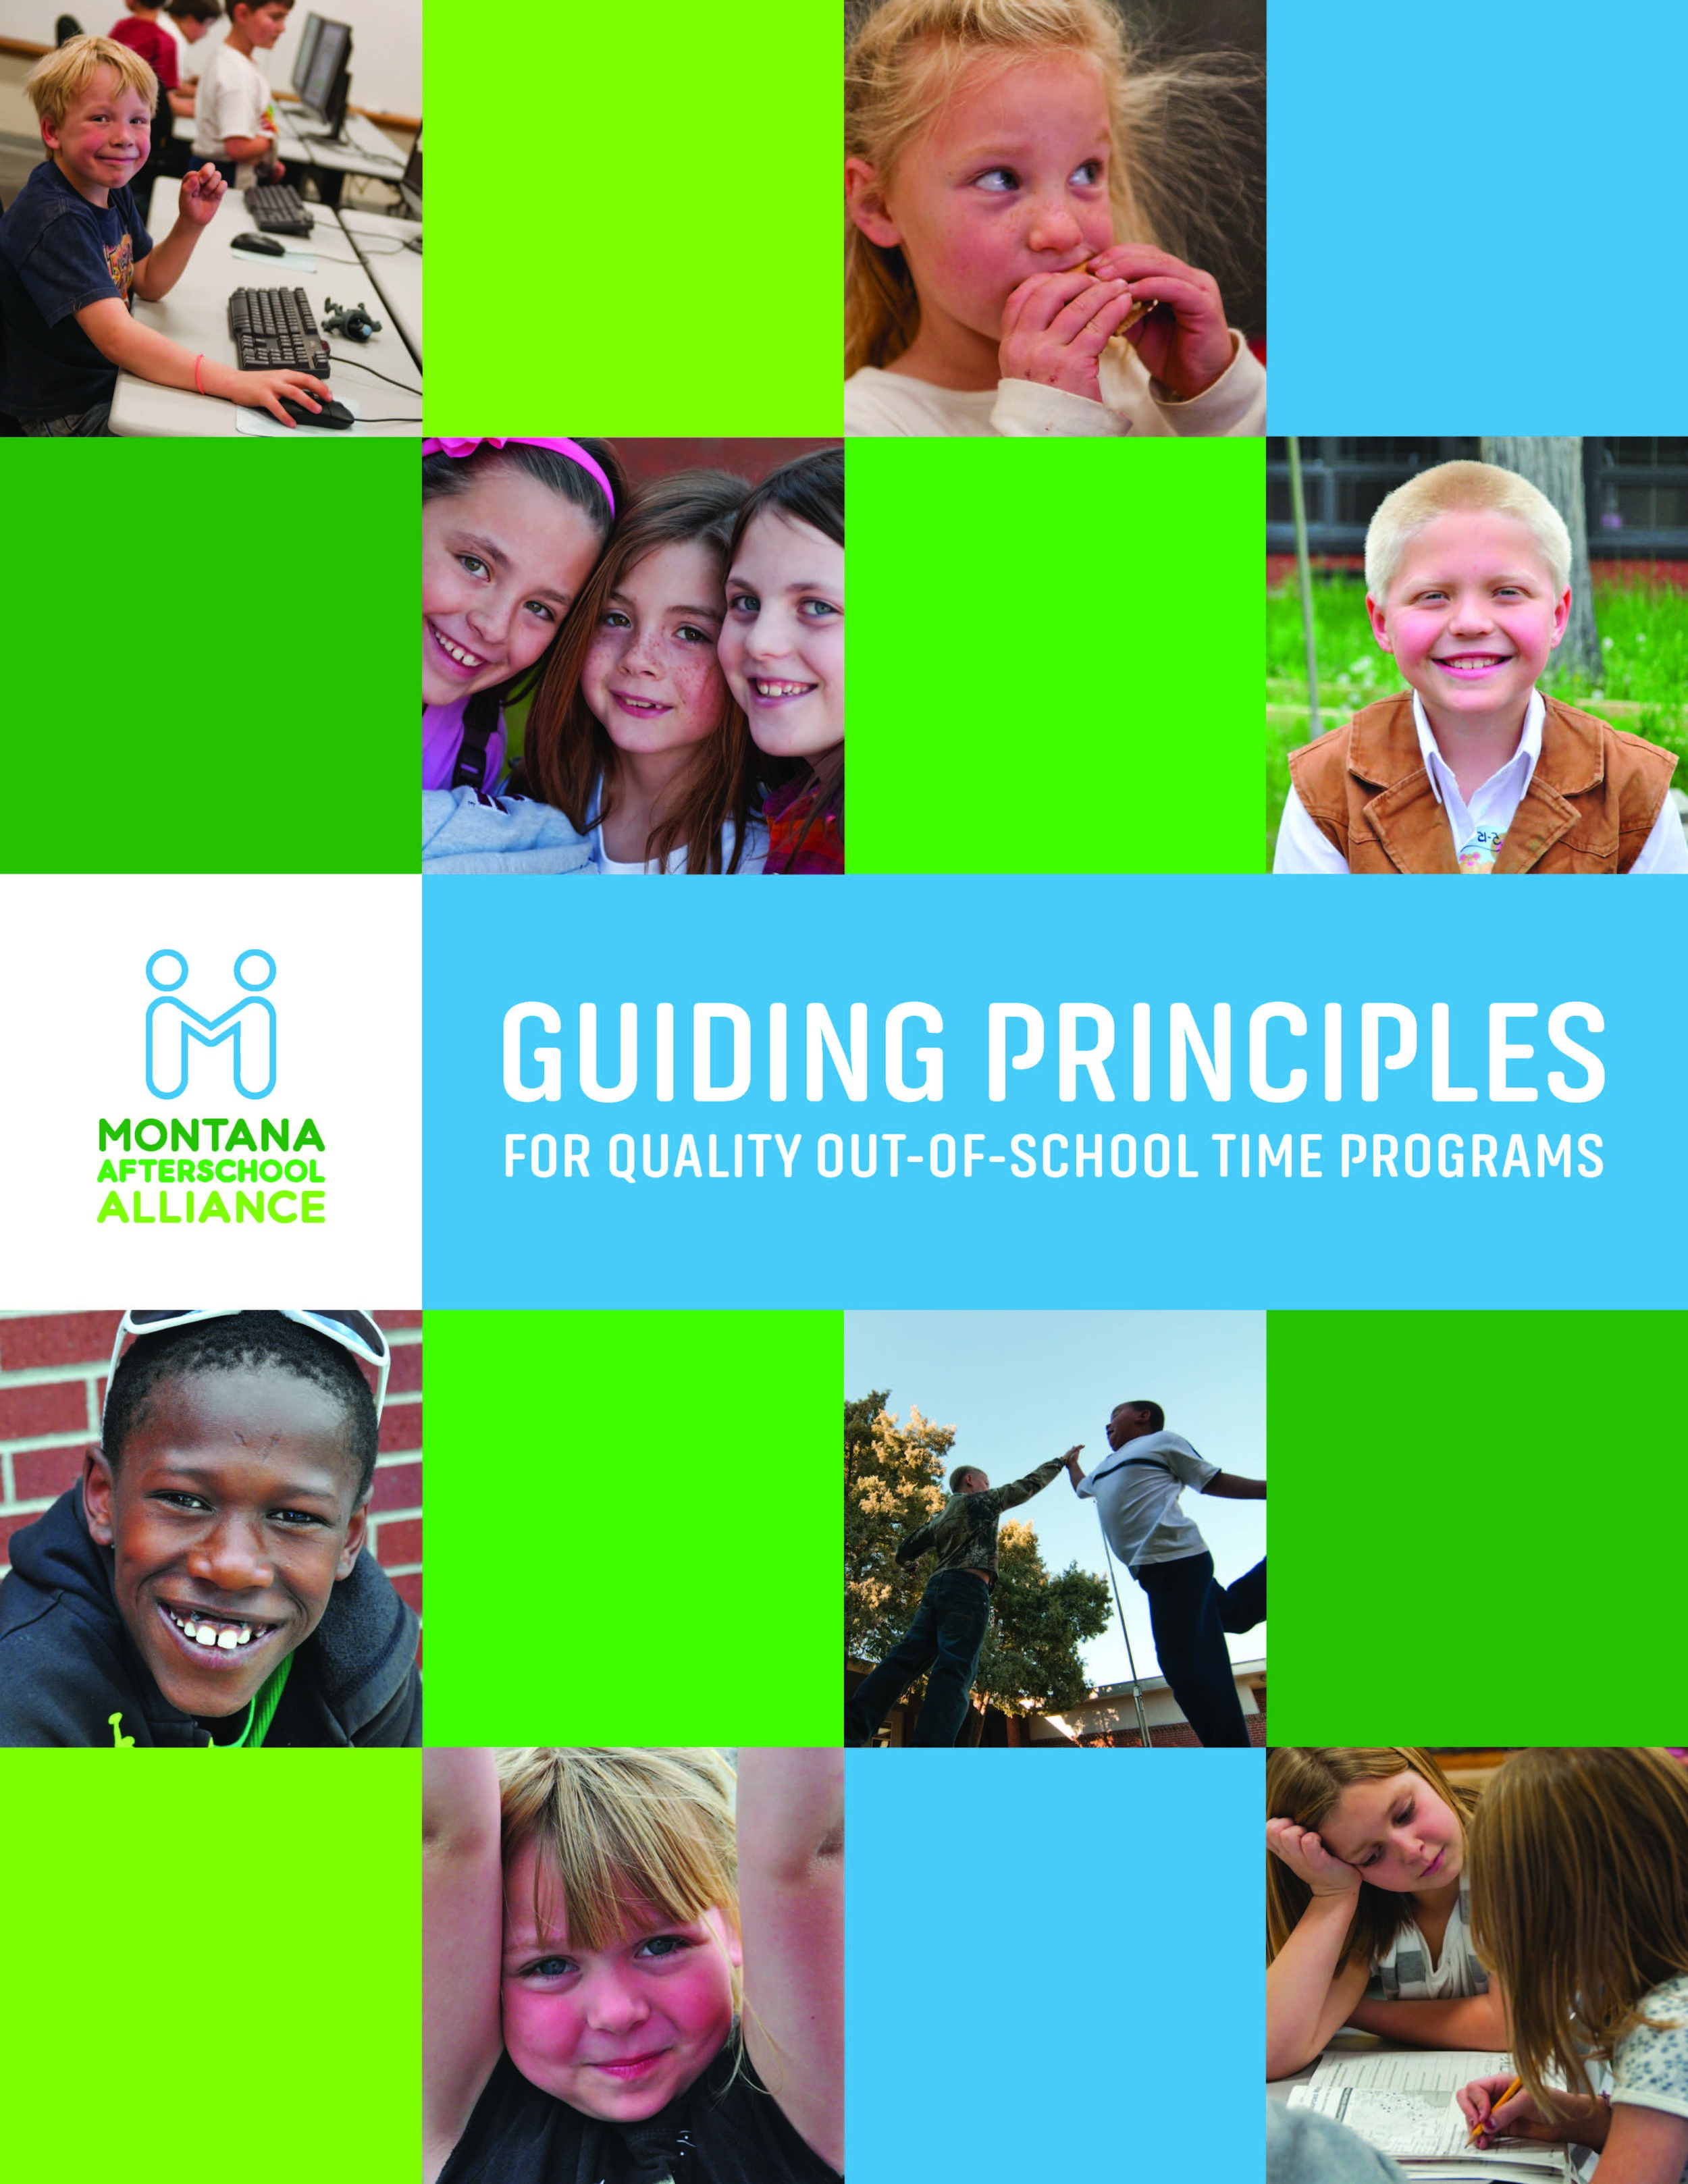 Guding Principles cover_Page_01.jpg